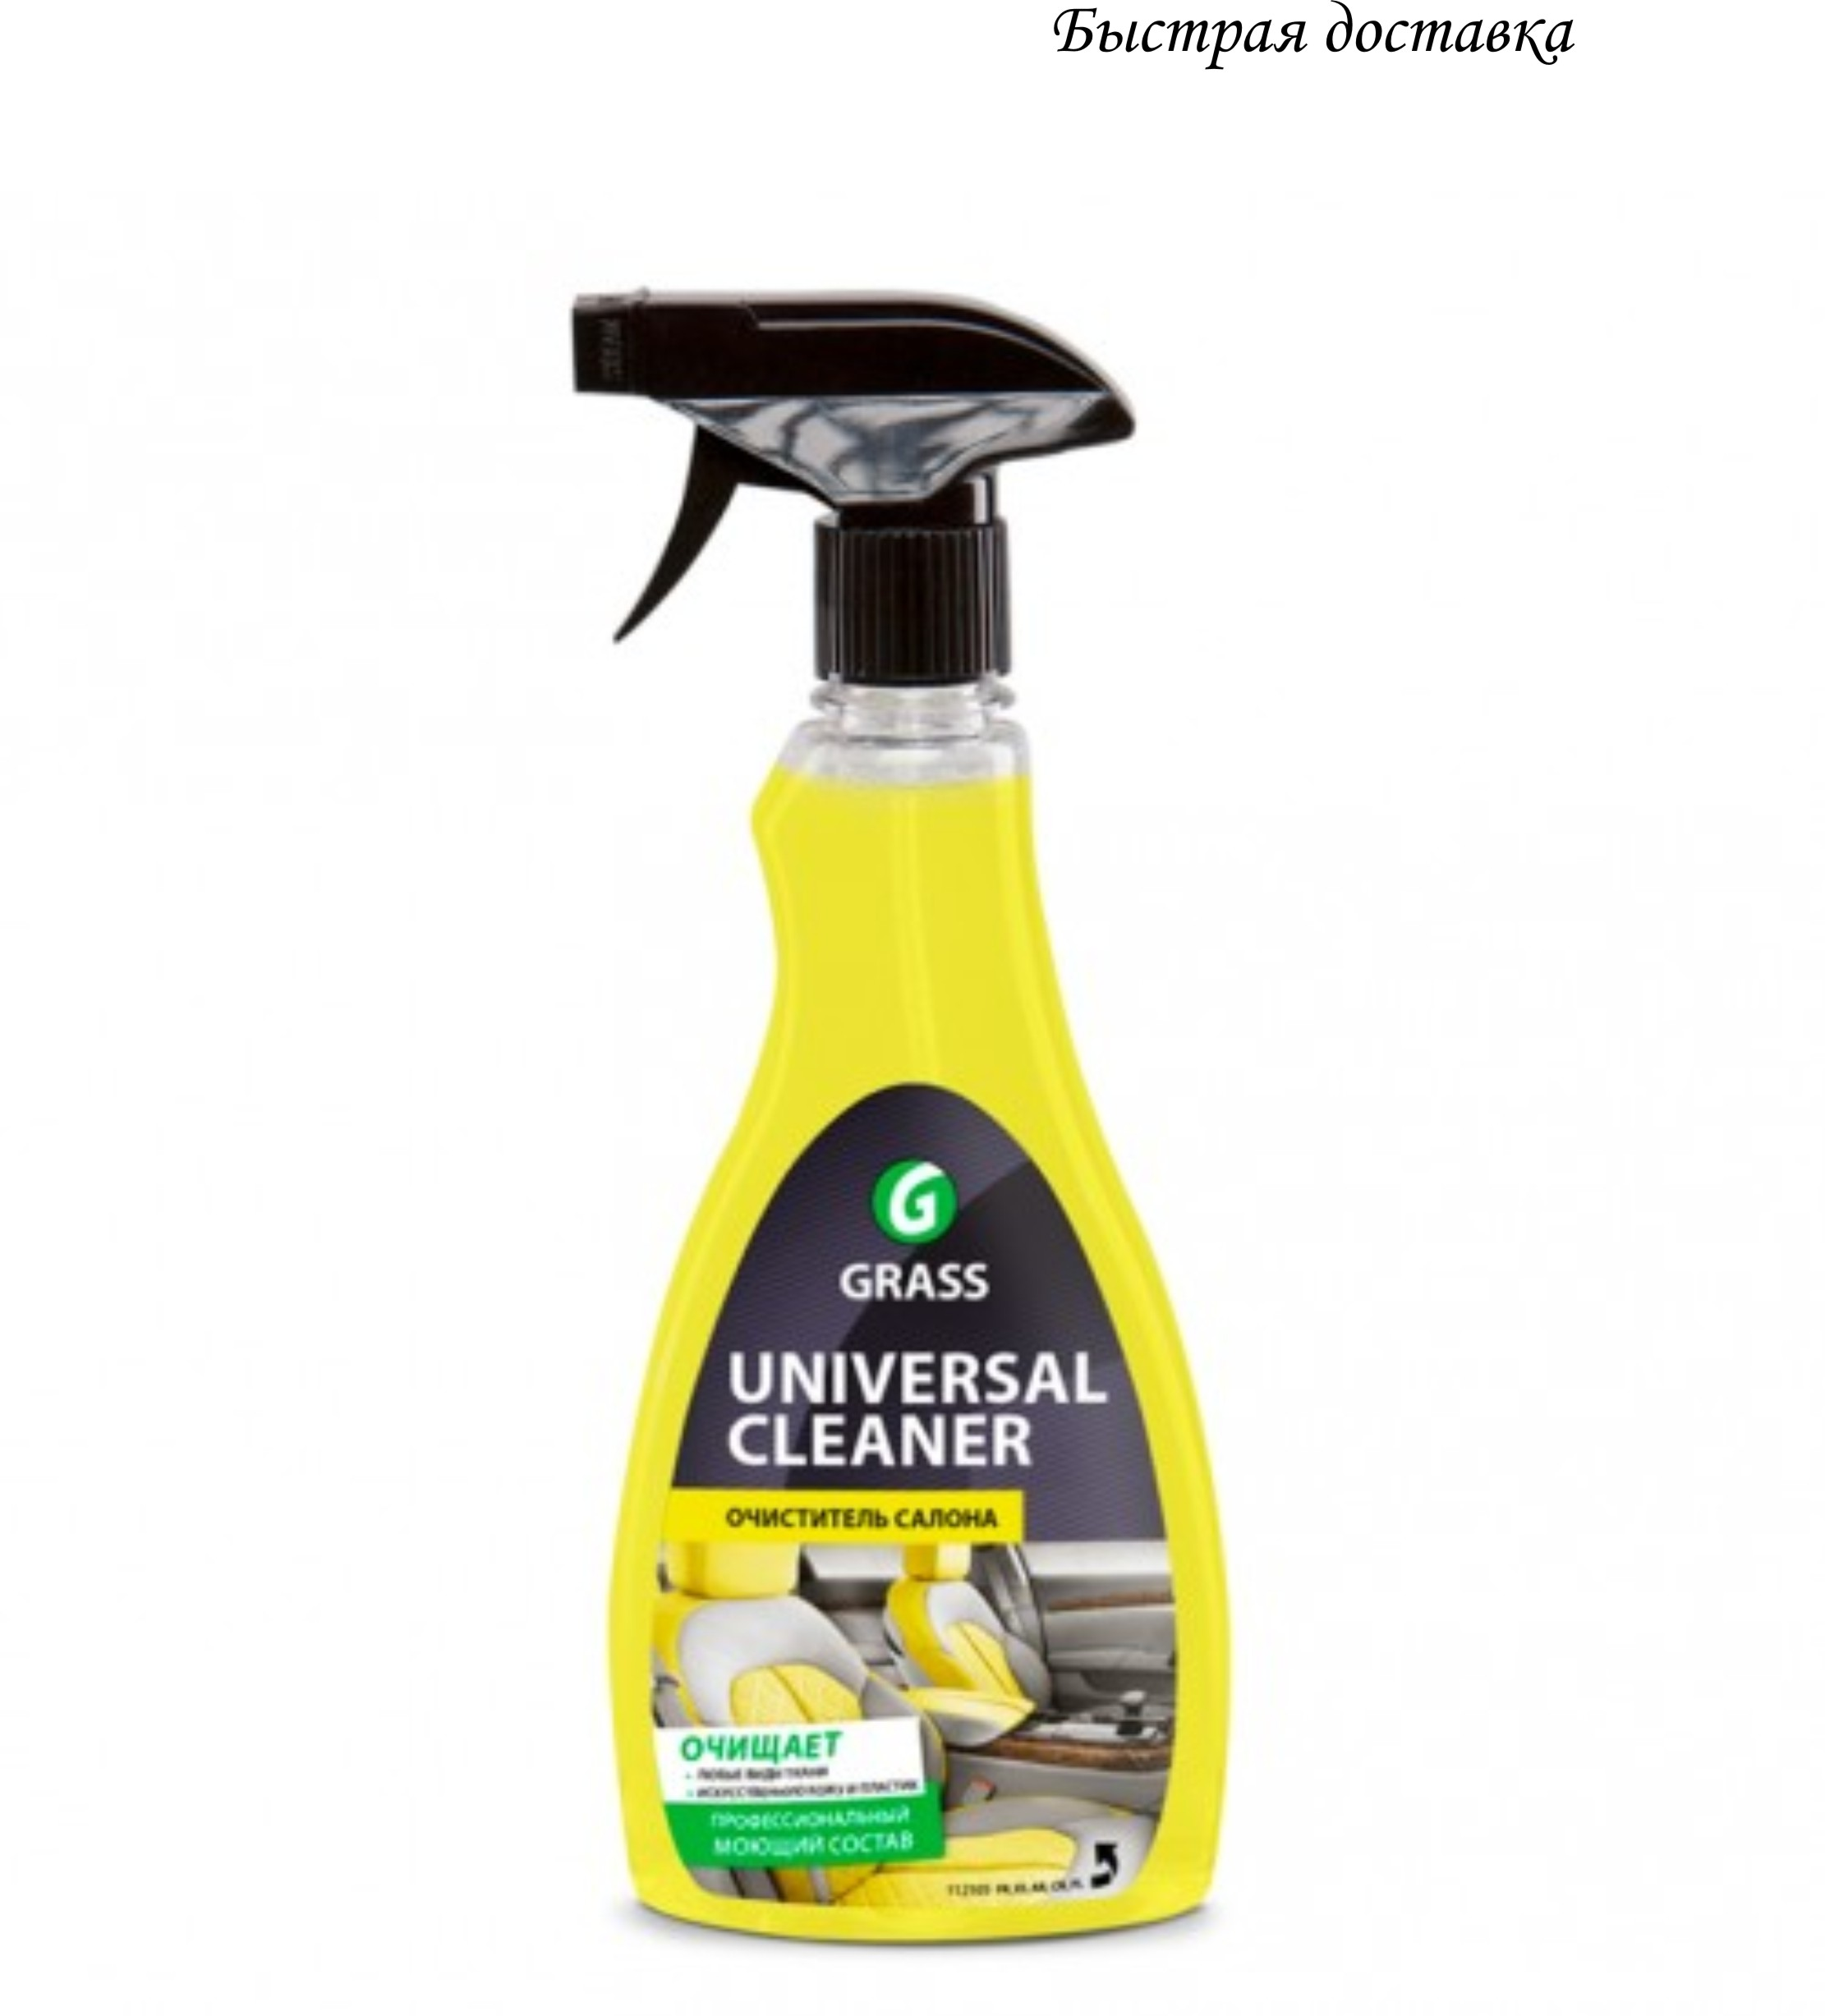 Cleaner Salon унив. Grass Universal Cleaner 500 Ml (триг.)